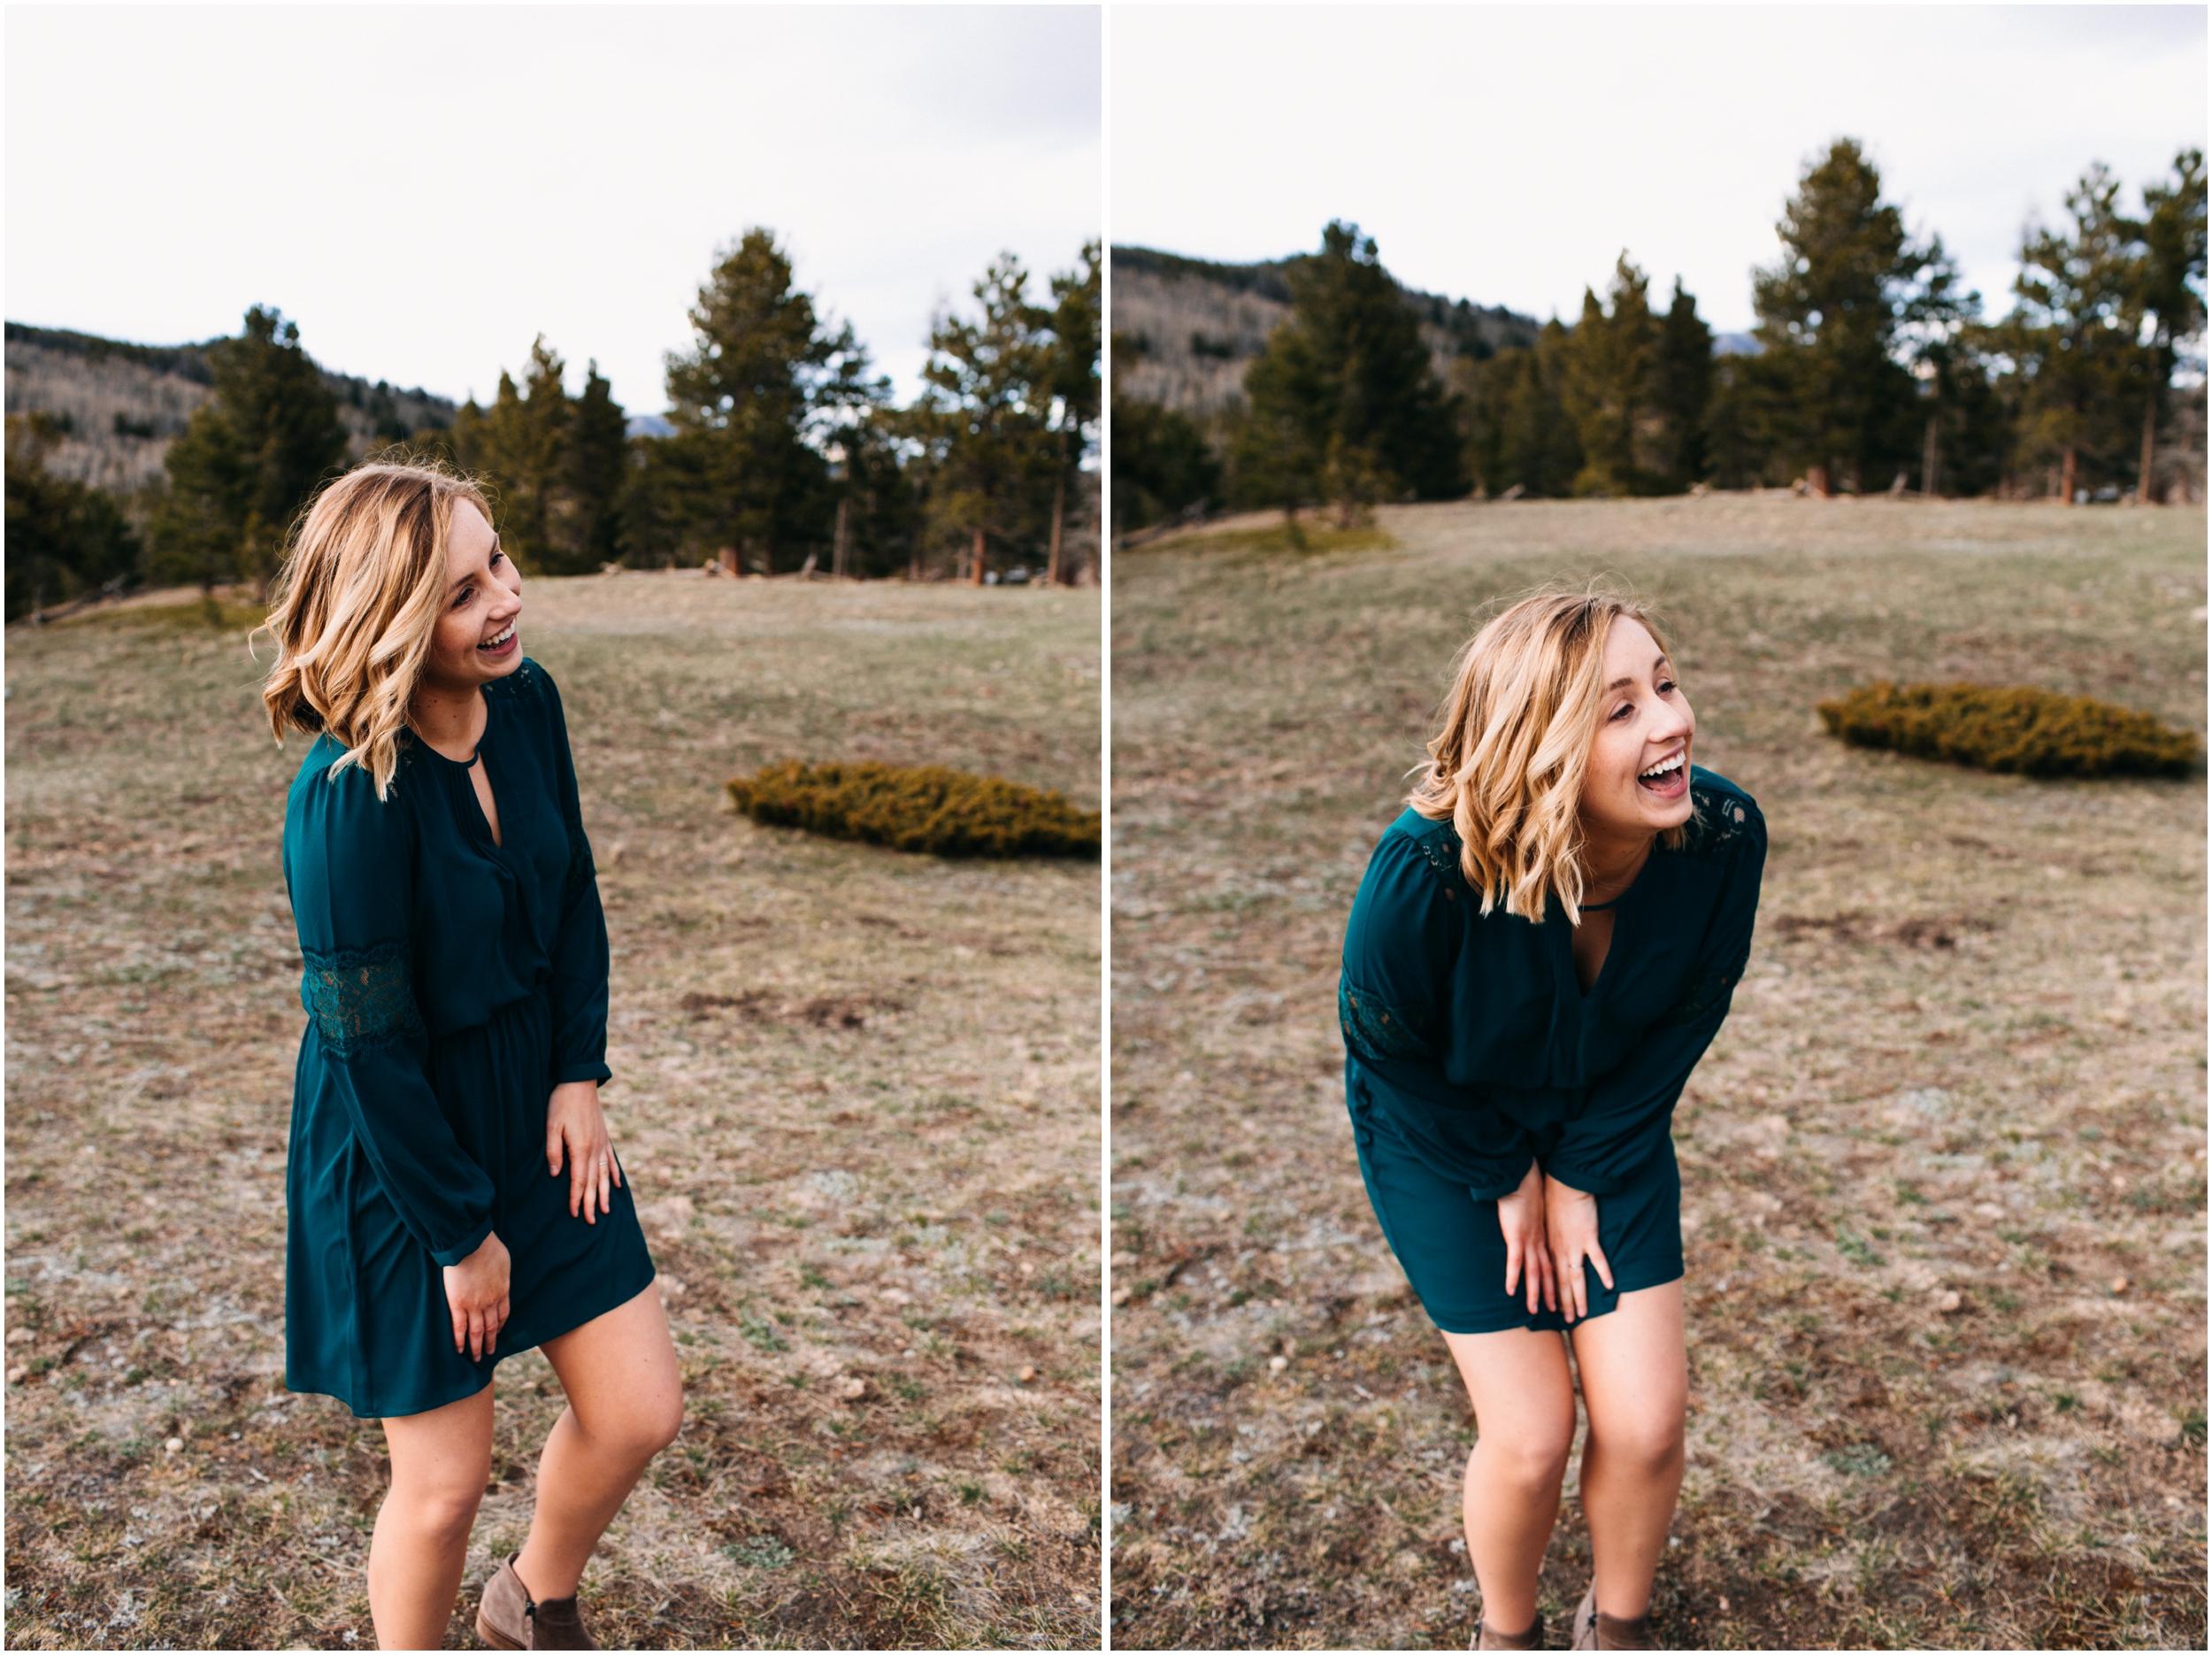 rocky-mountain-national-park-elopement-sprague-lake-colorado-adventure-wedding-photographer_taylor-powers_105.jpg